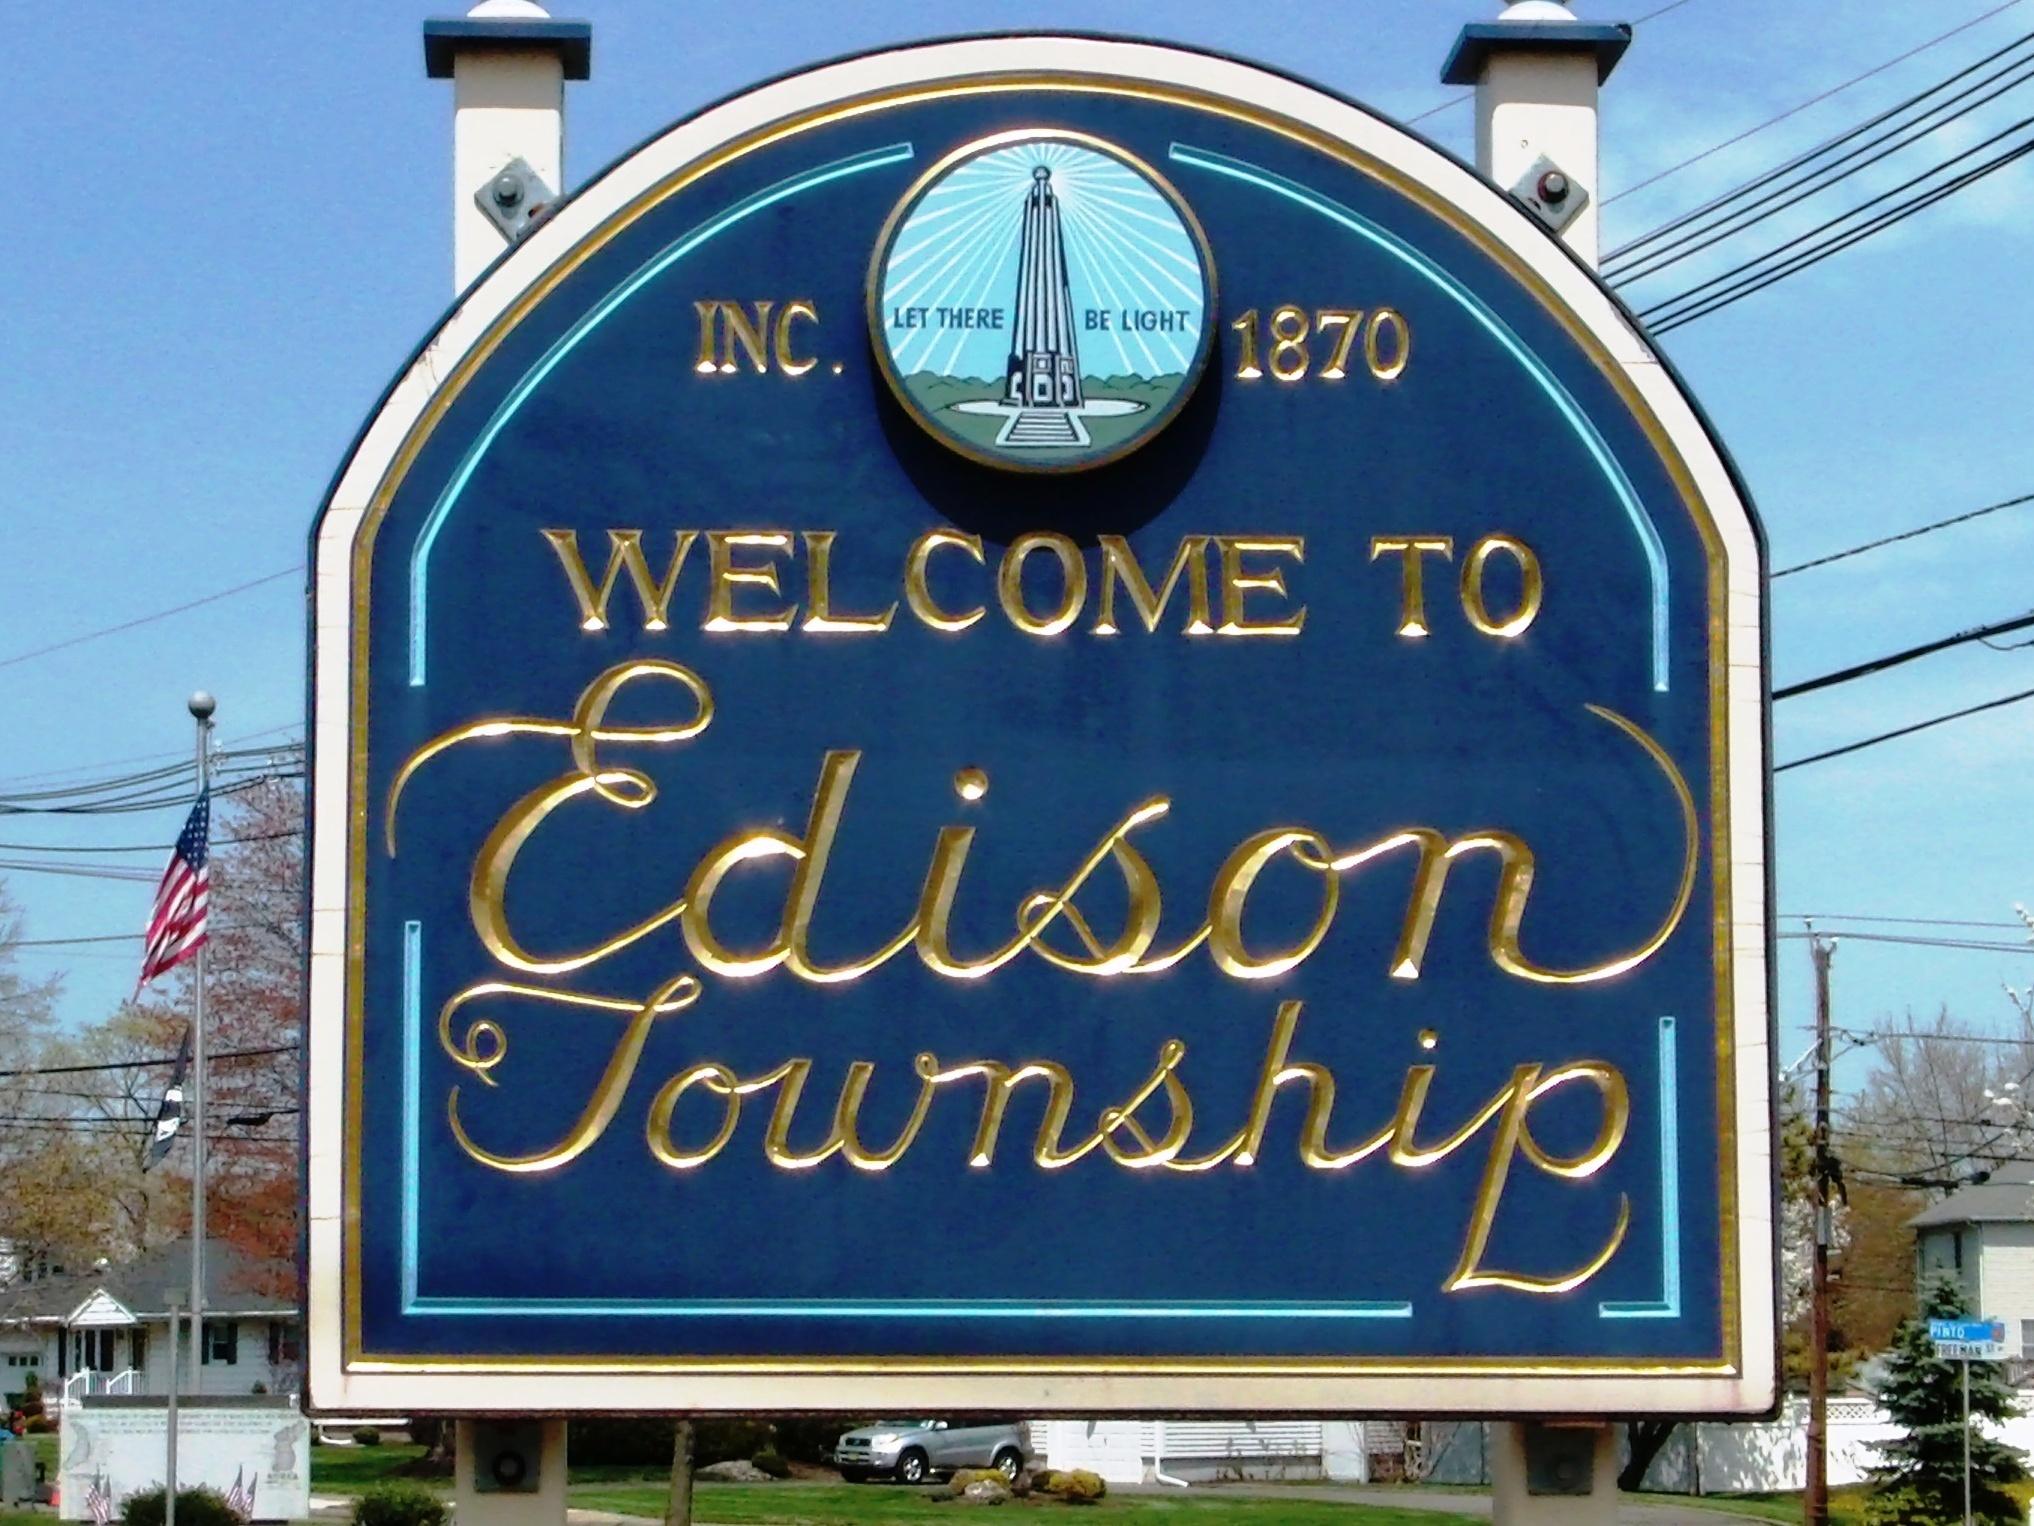 07d22613364f021b9dfa_best_82a7918ebac9a0e10899_Sign_Welcome_To_Edison__3_.jpg